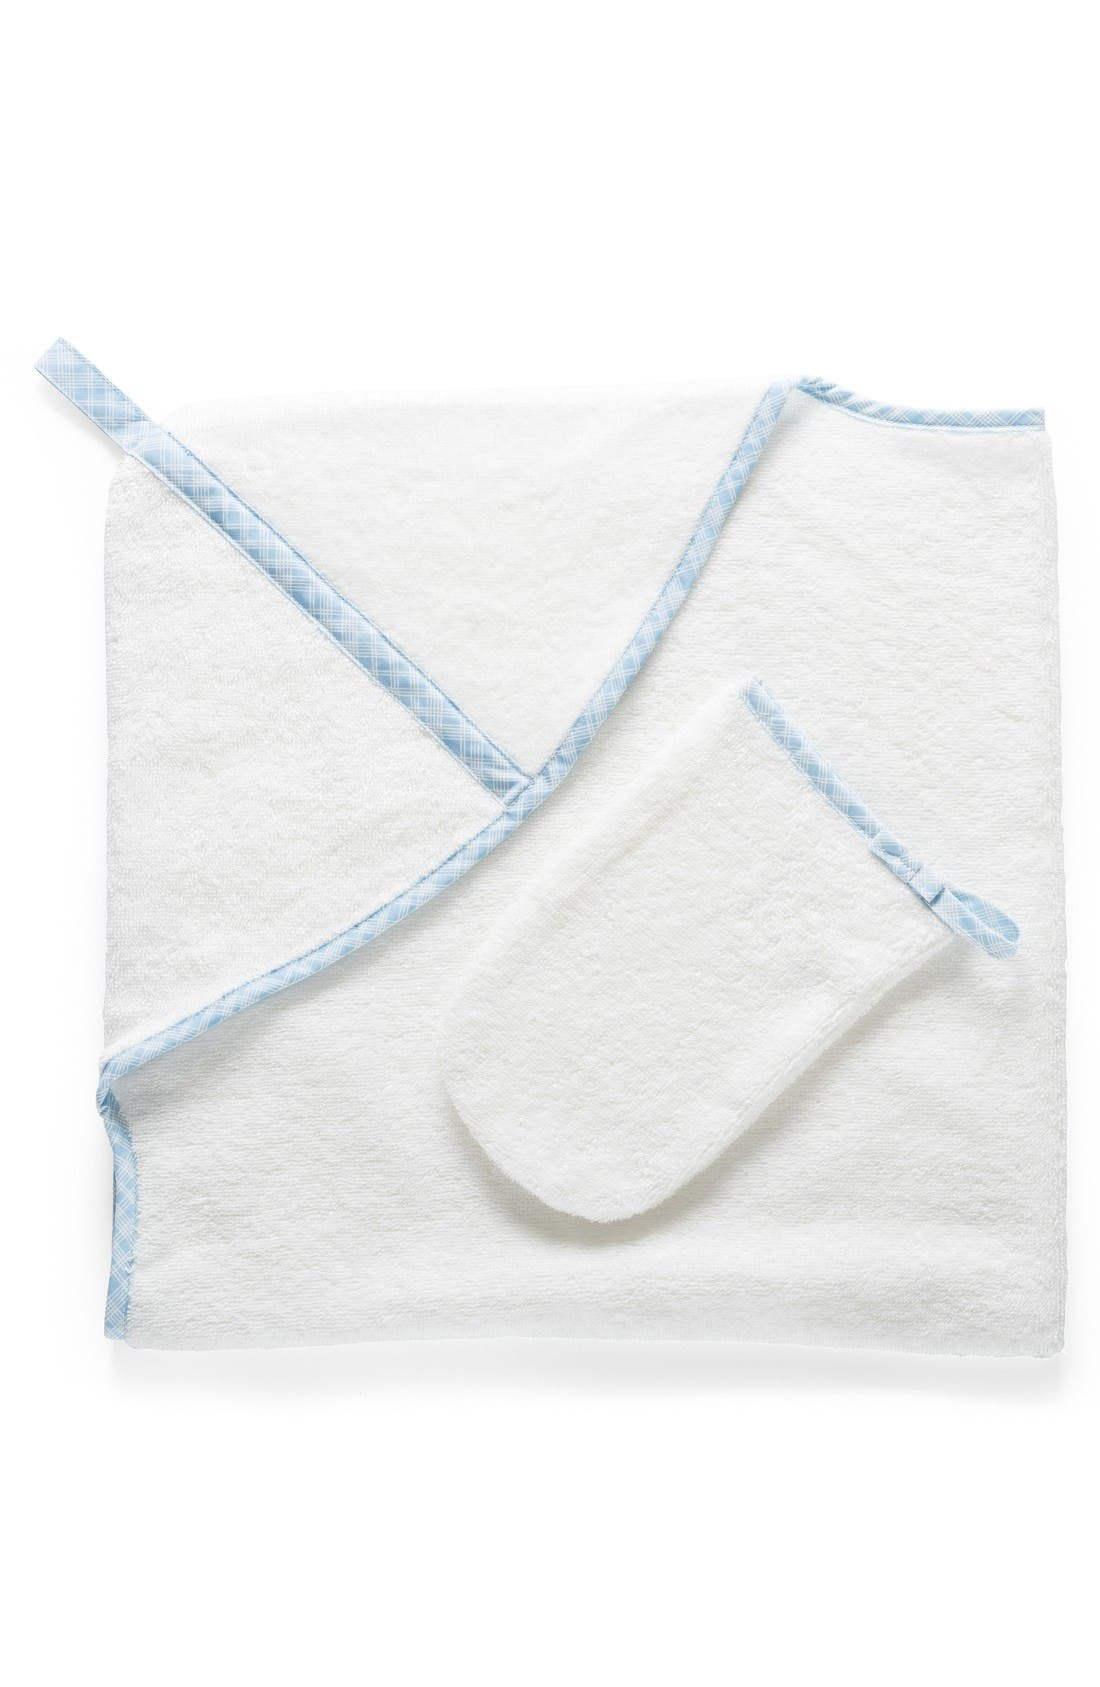 Hooded Towel & Bath Mitt Set,                         Main,                         color, Blue Checks